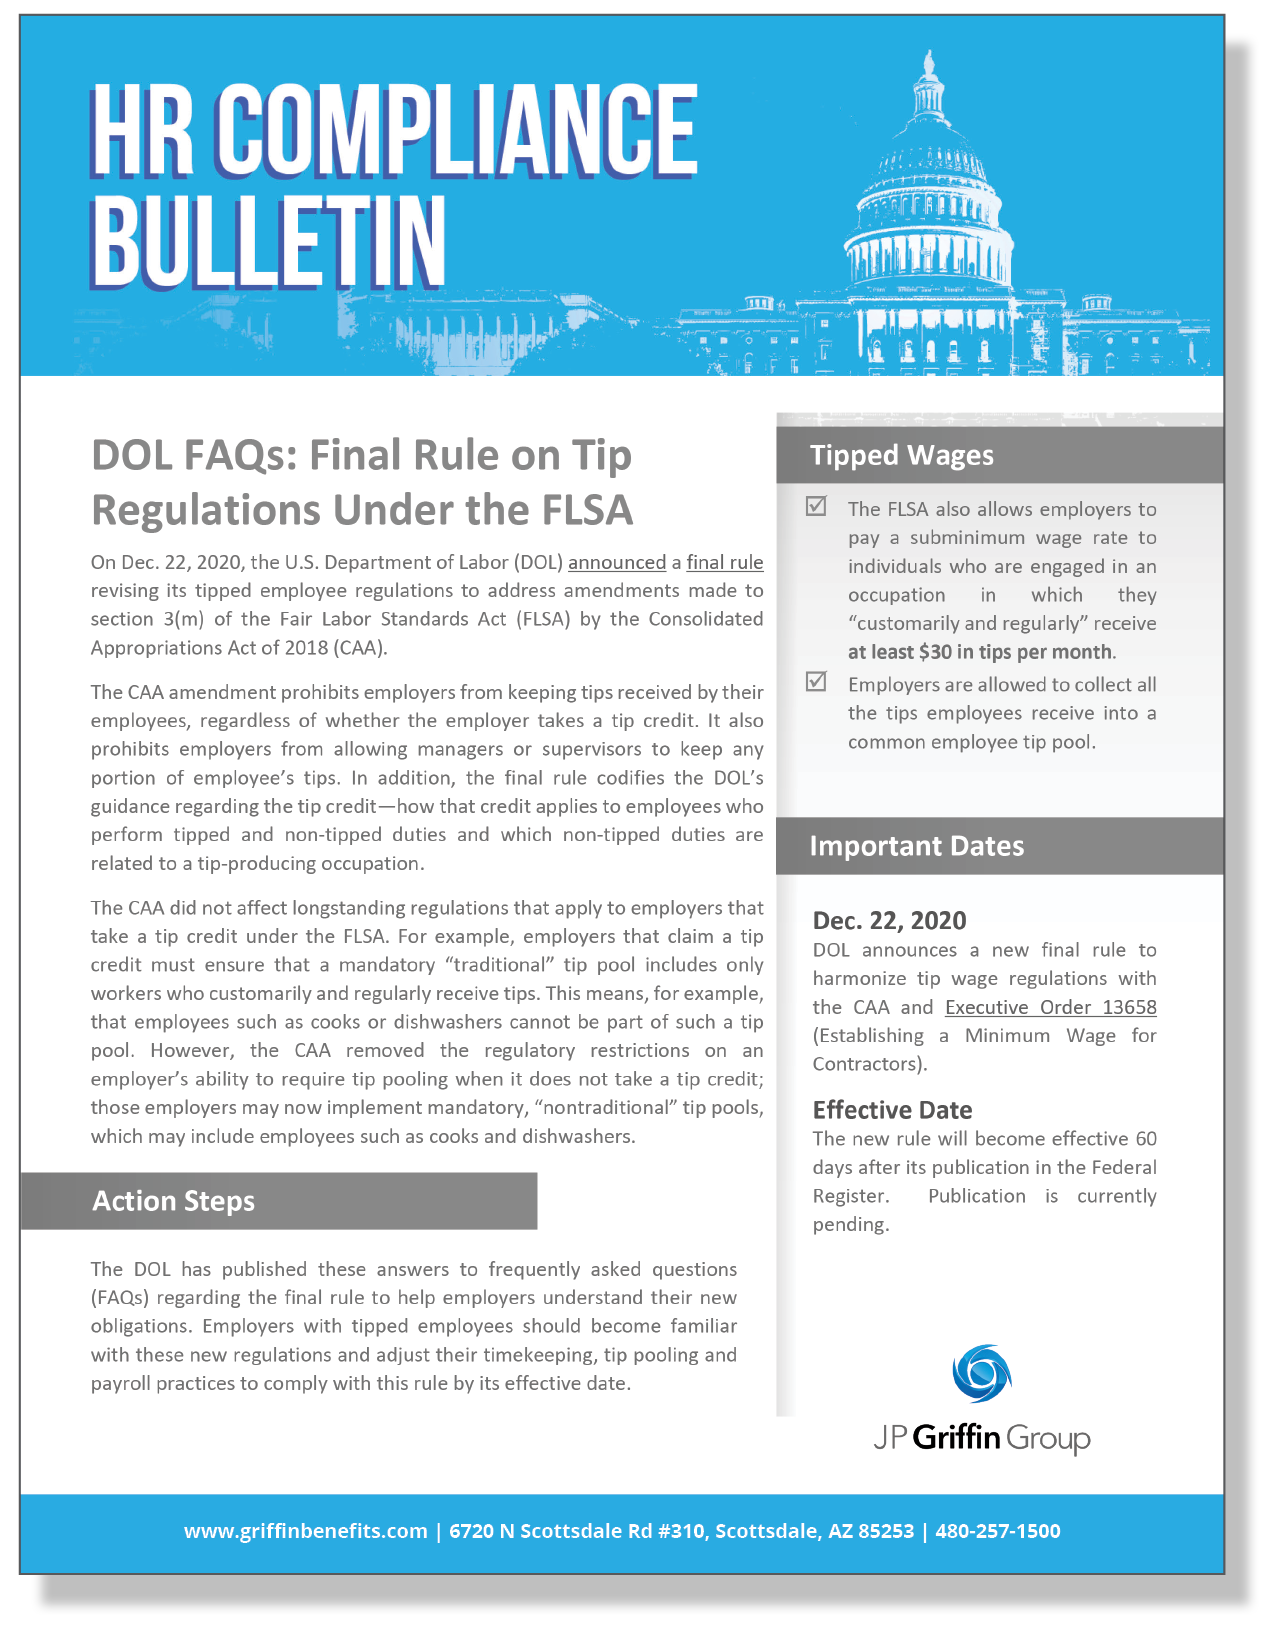 DOL FAQs - Final Rule on Employee Tip Regulations Under the FLSA